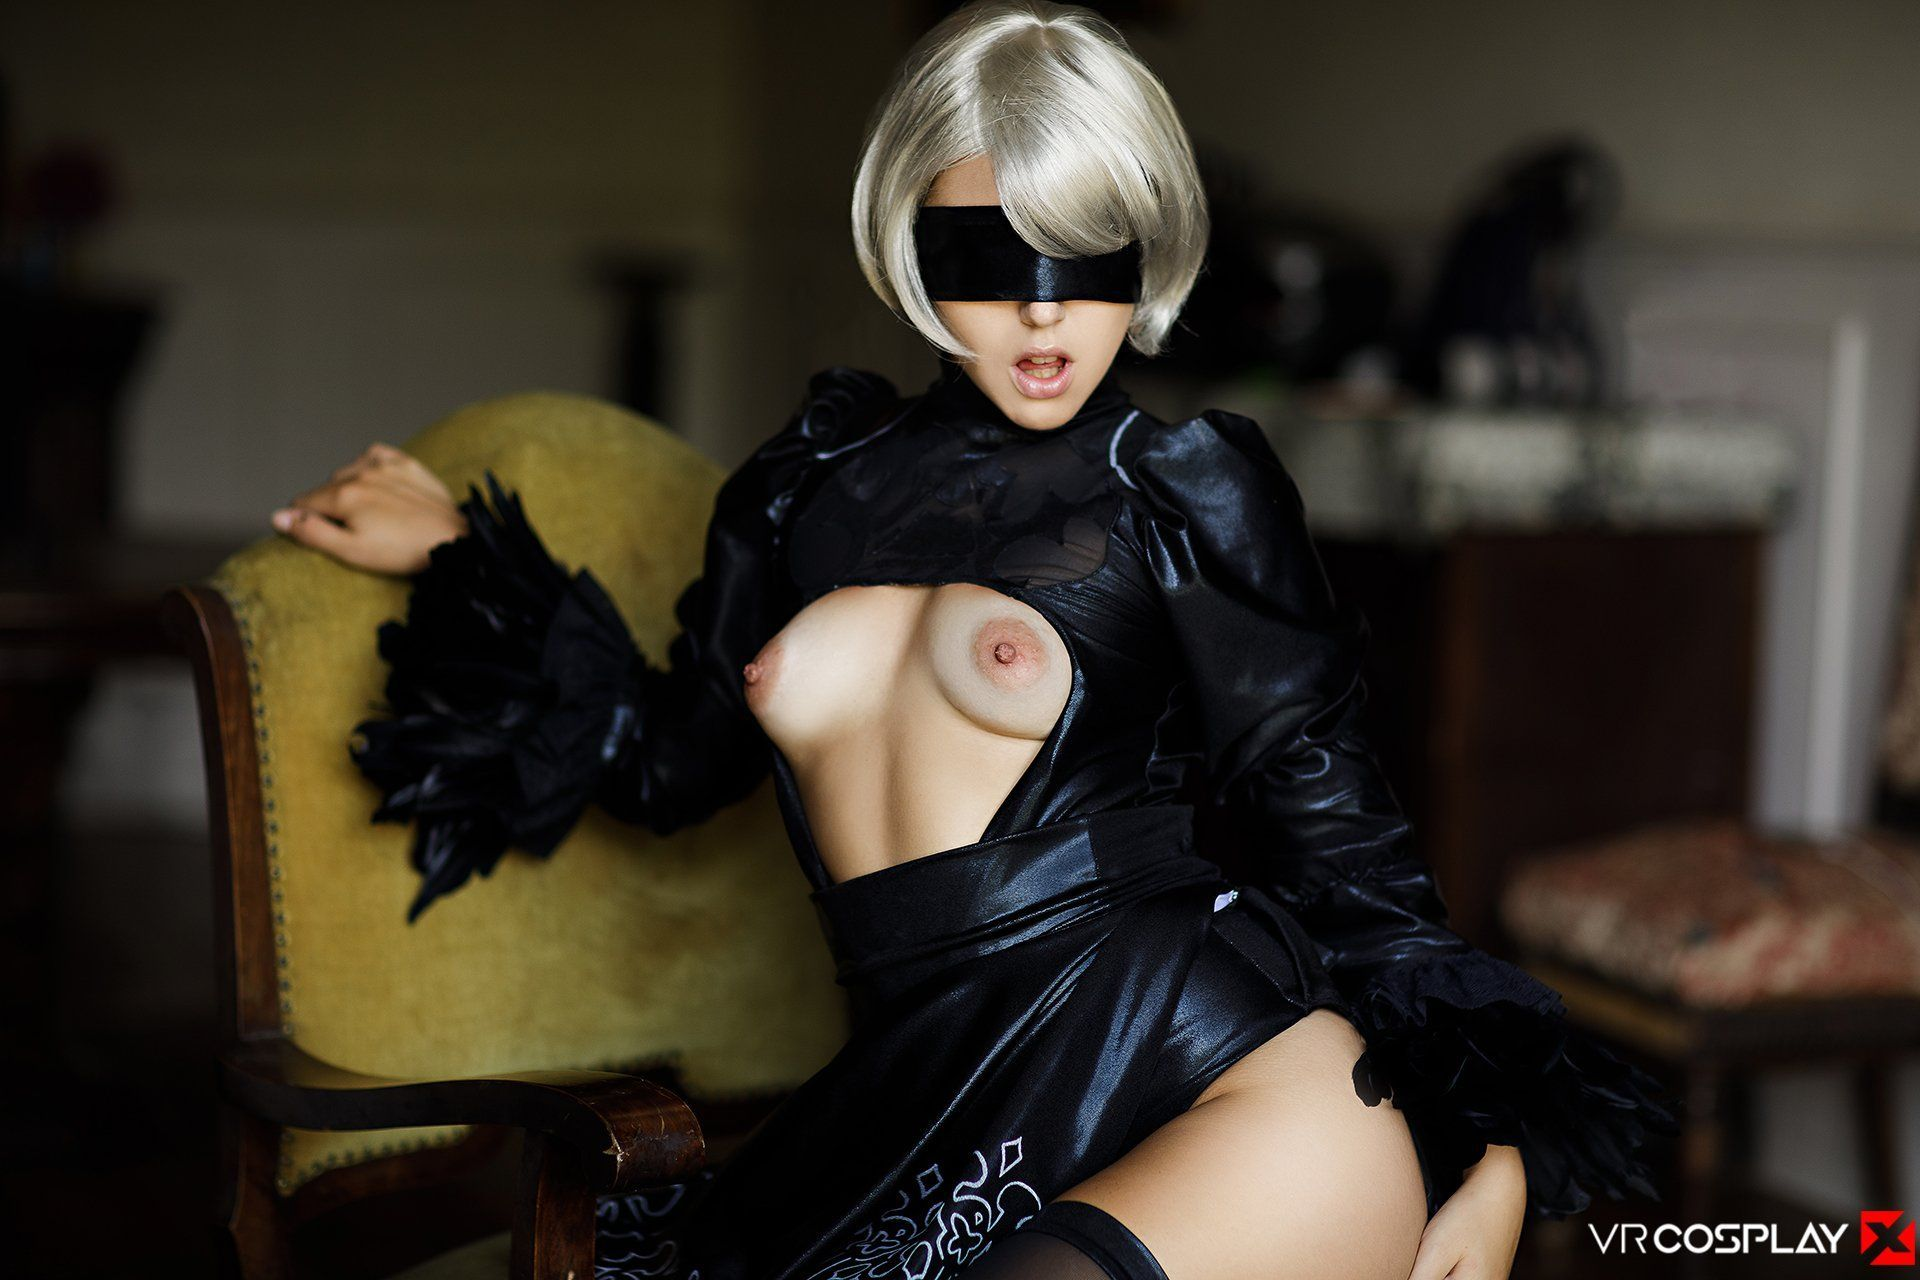 Nier Automata Xxx nier automata 2b cosplay . xxx sex photos. comments: 1